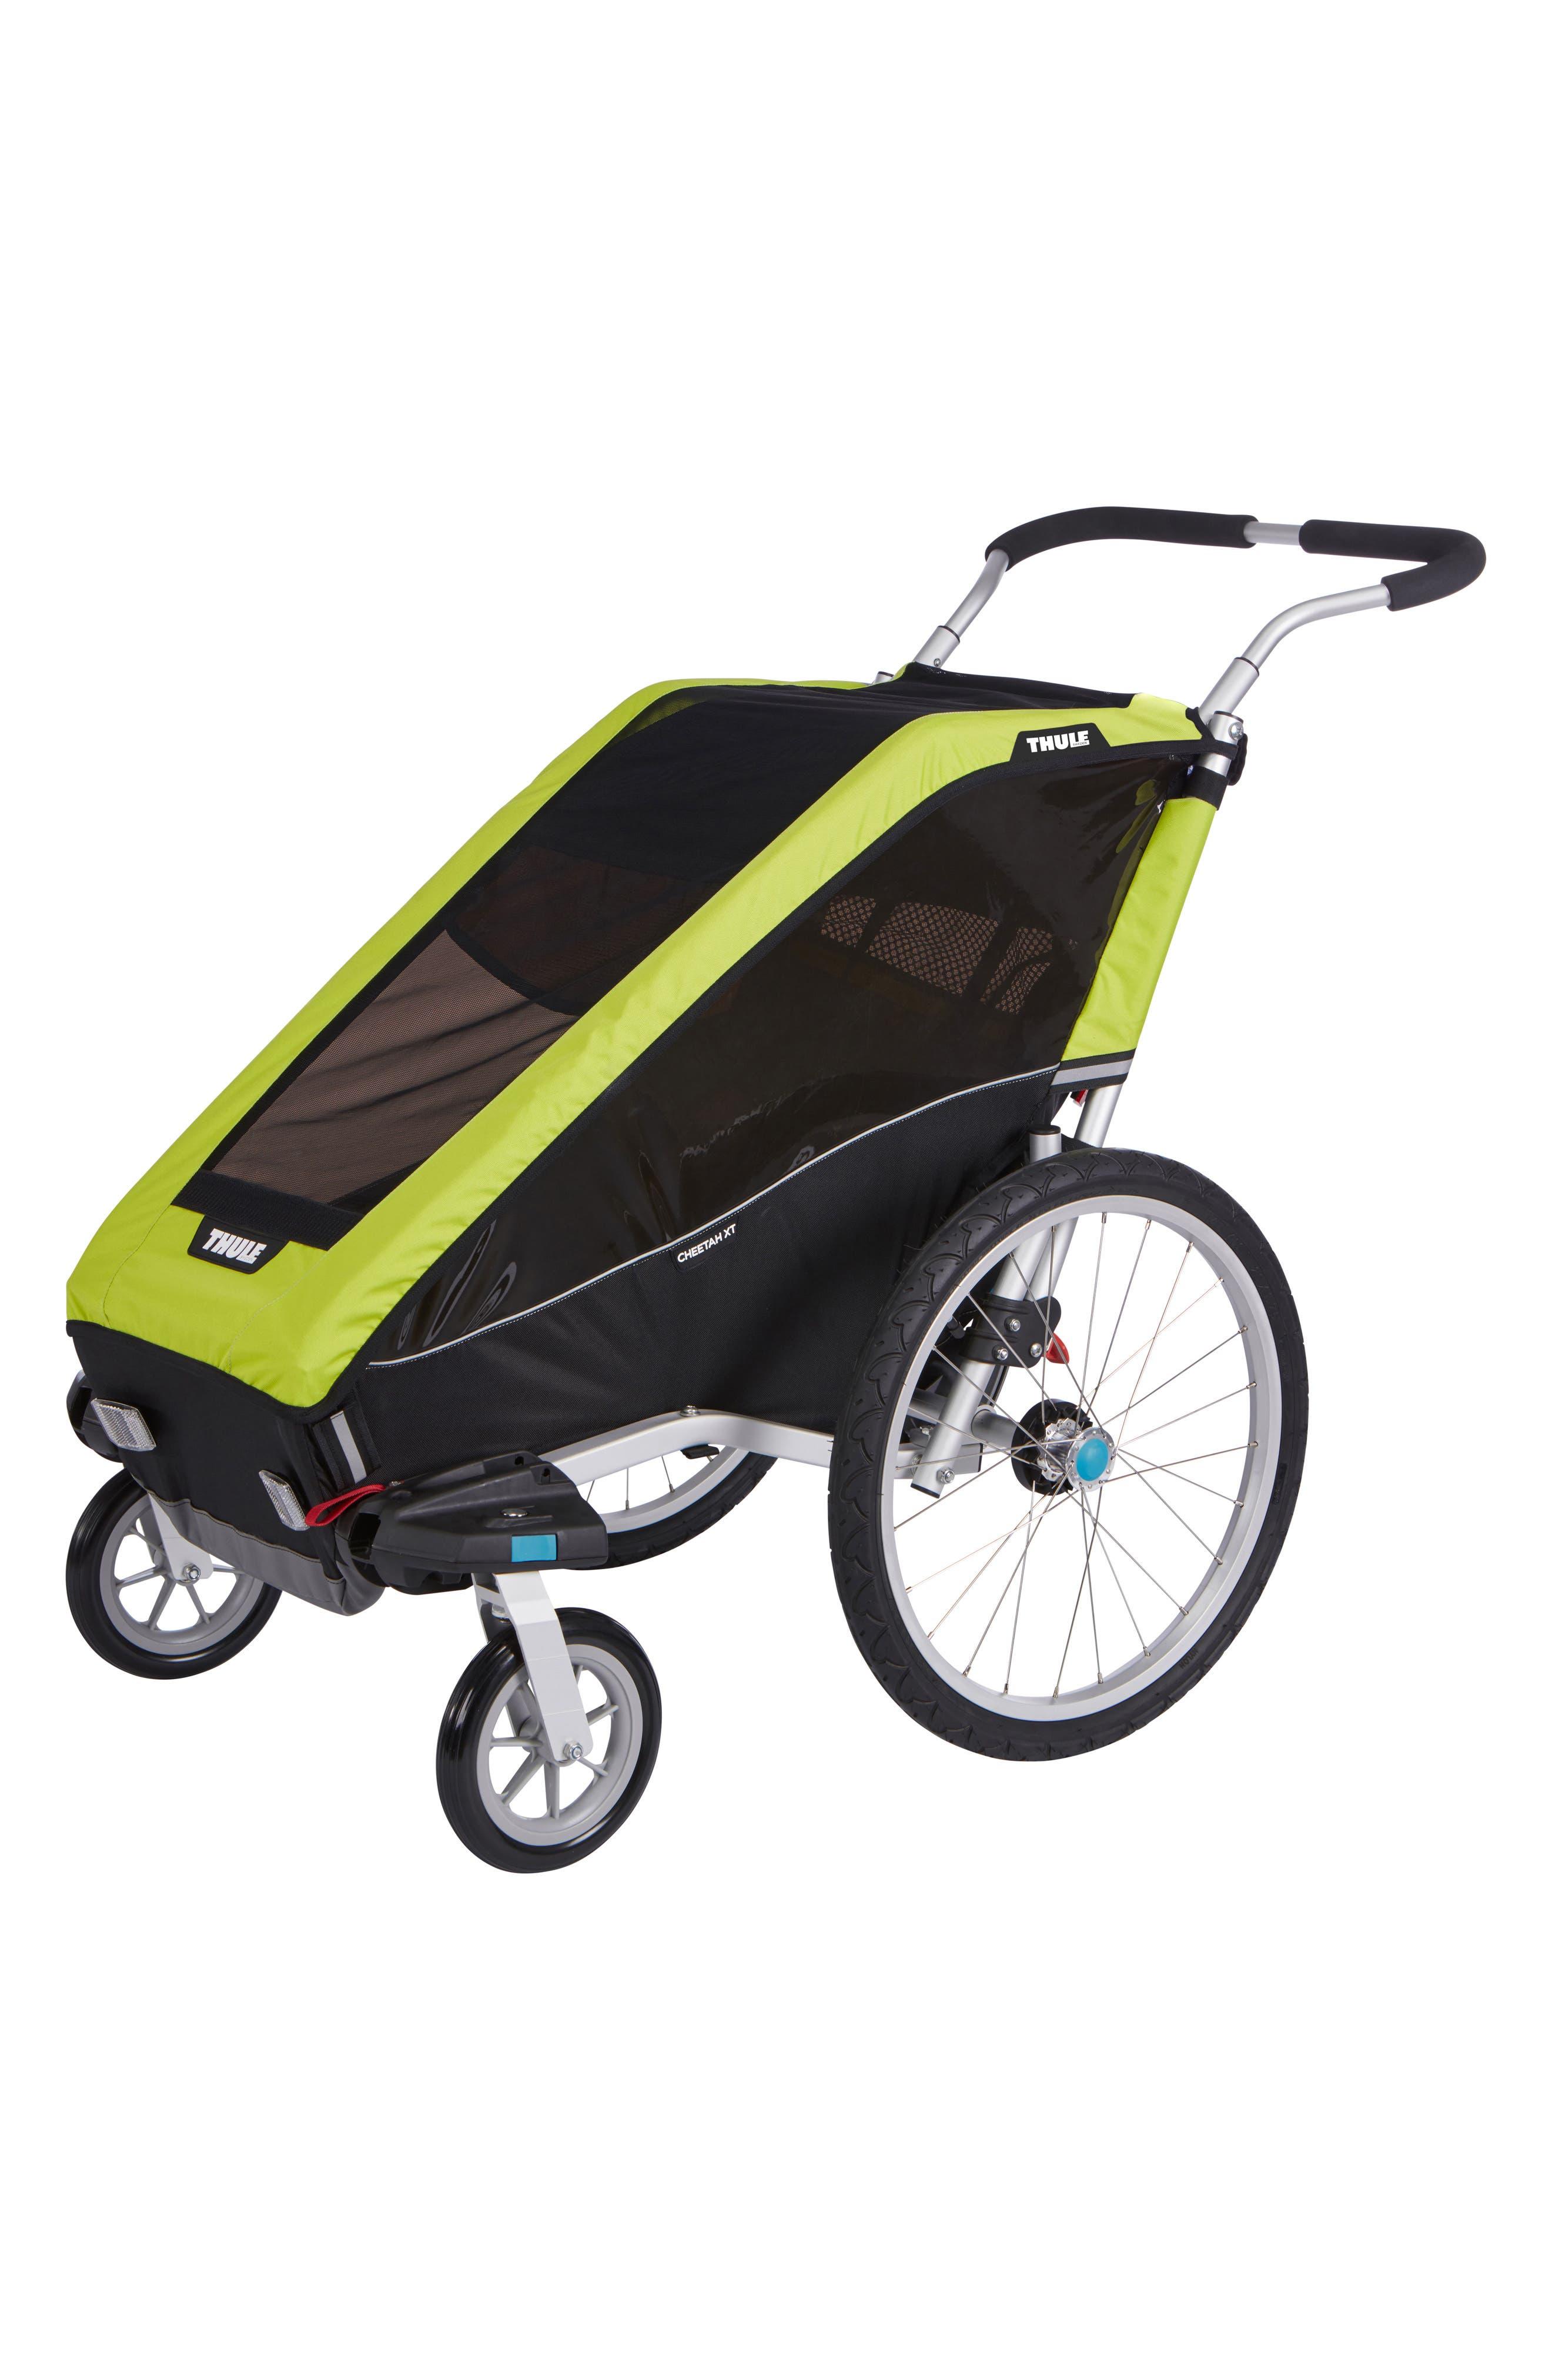 Main Image - Thule Chariot Cheetah XT 2 Multisport Cycle Trailer/Stroller